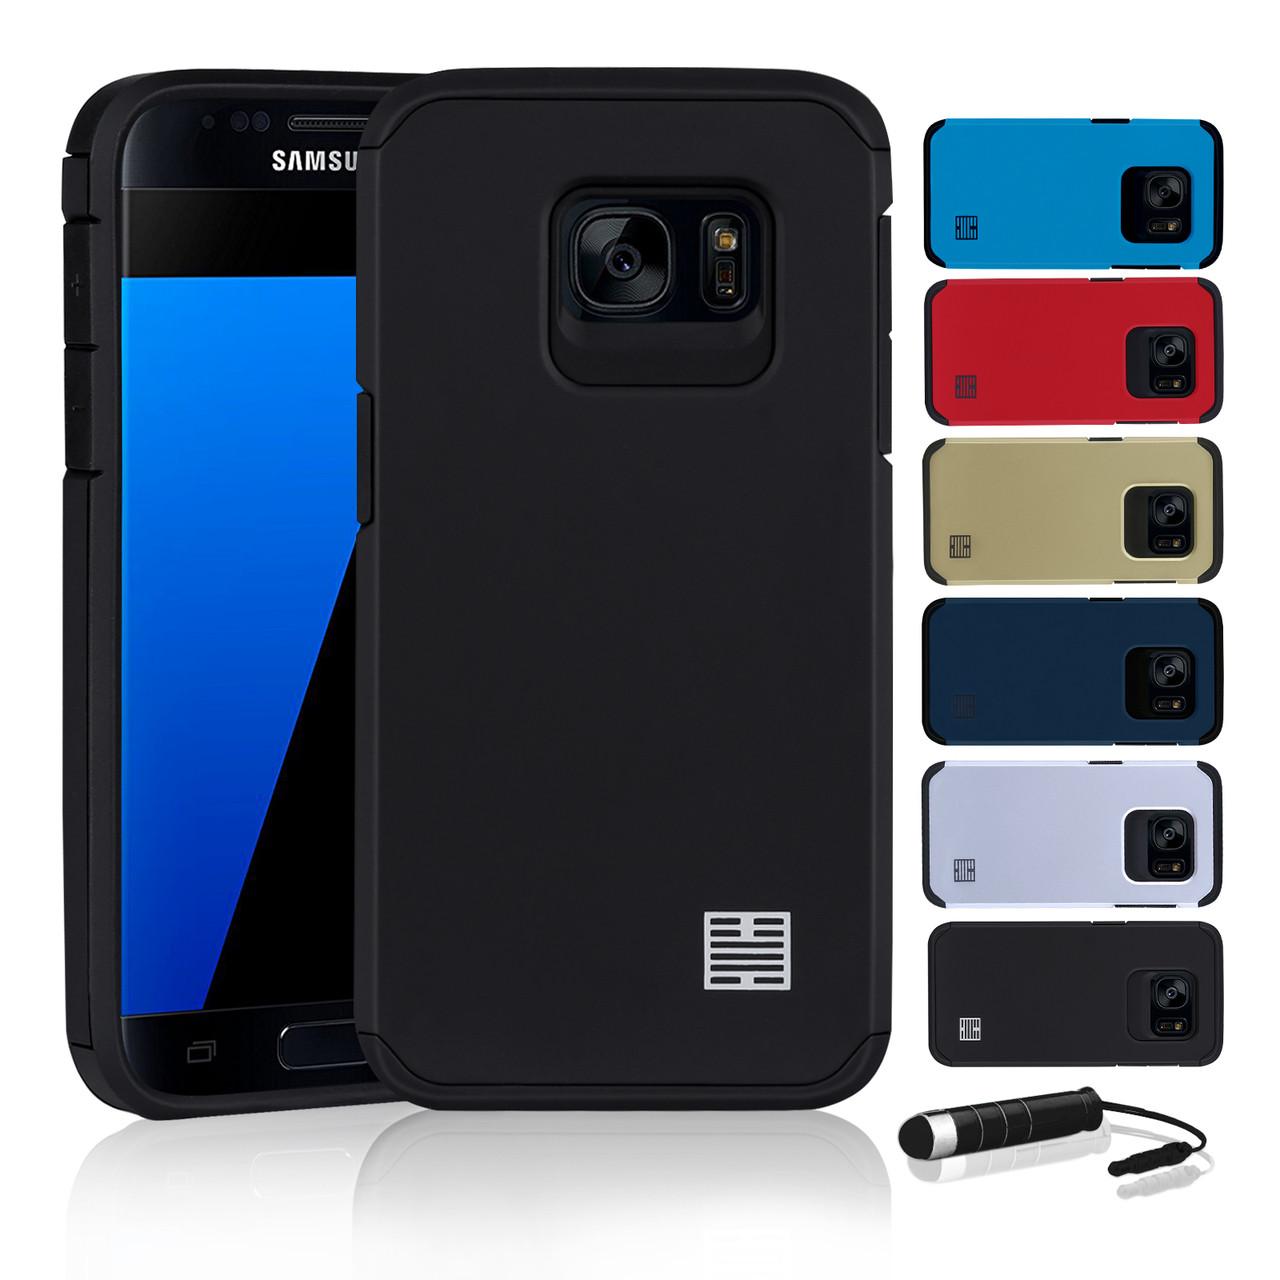 Samsung Galaxy S7 Slim Armour Shockproof Case 32ndshop